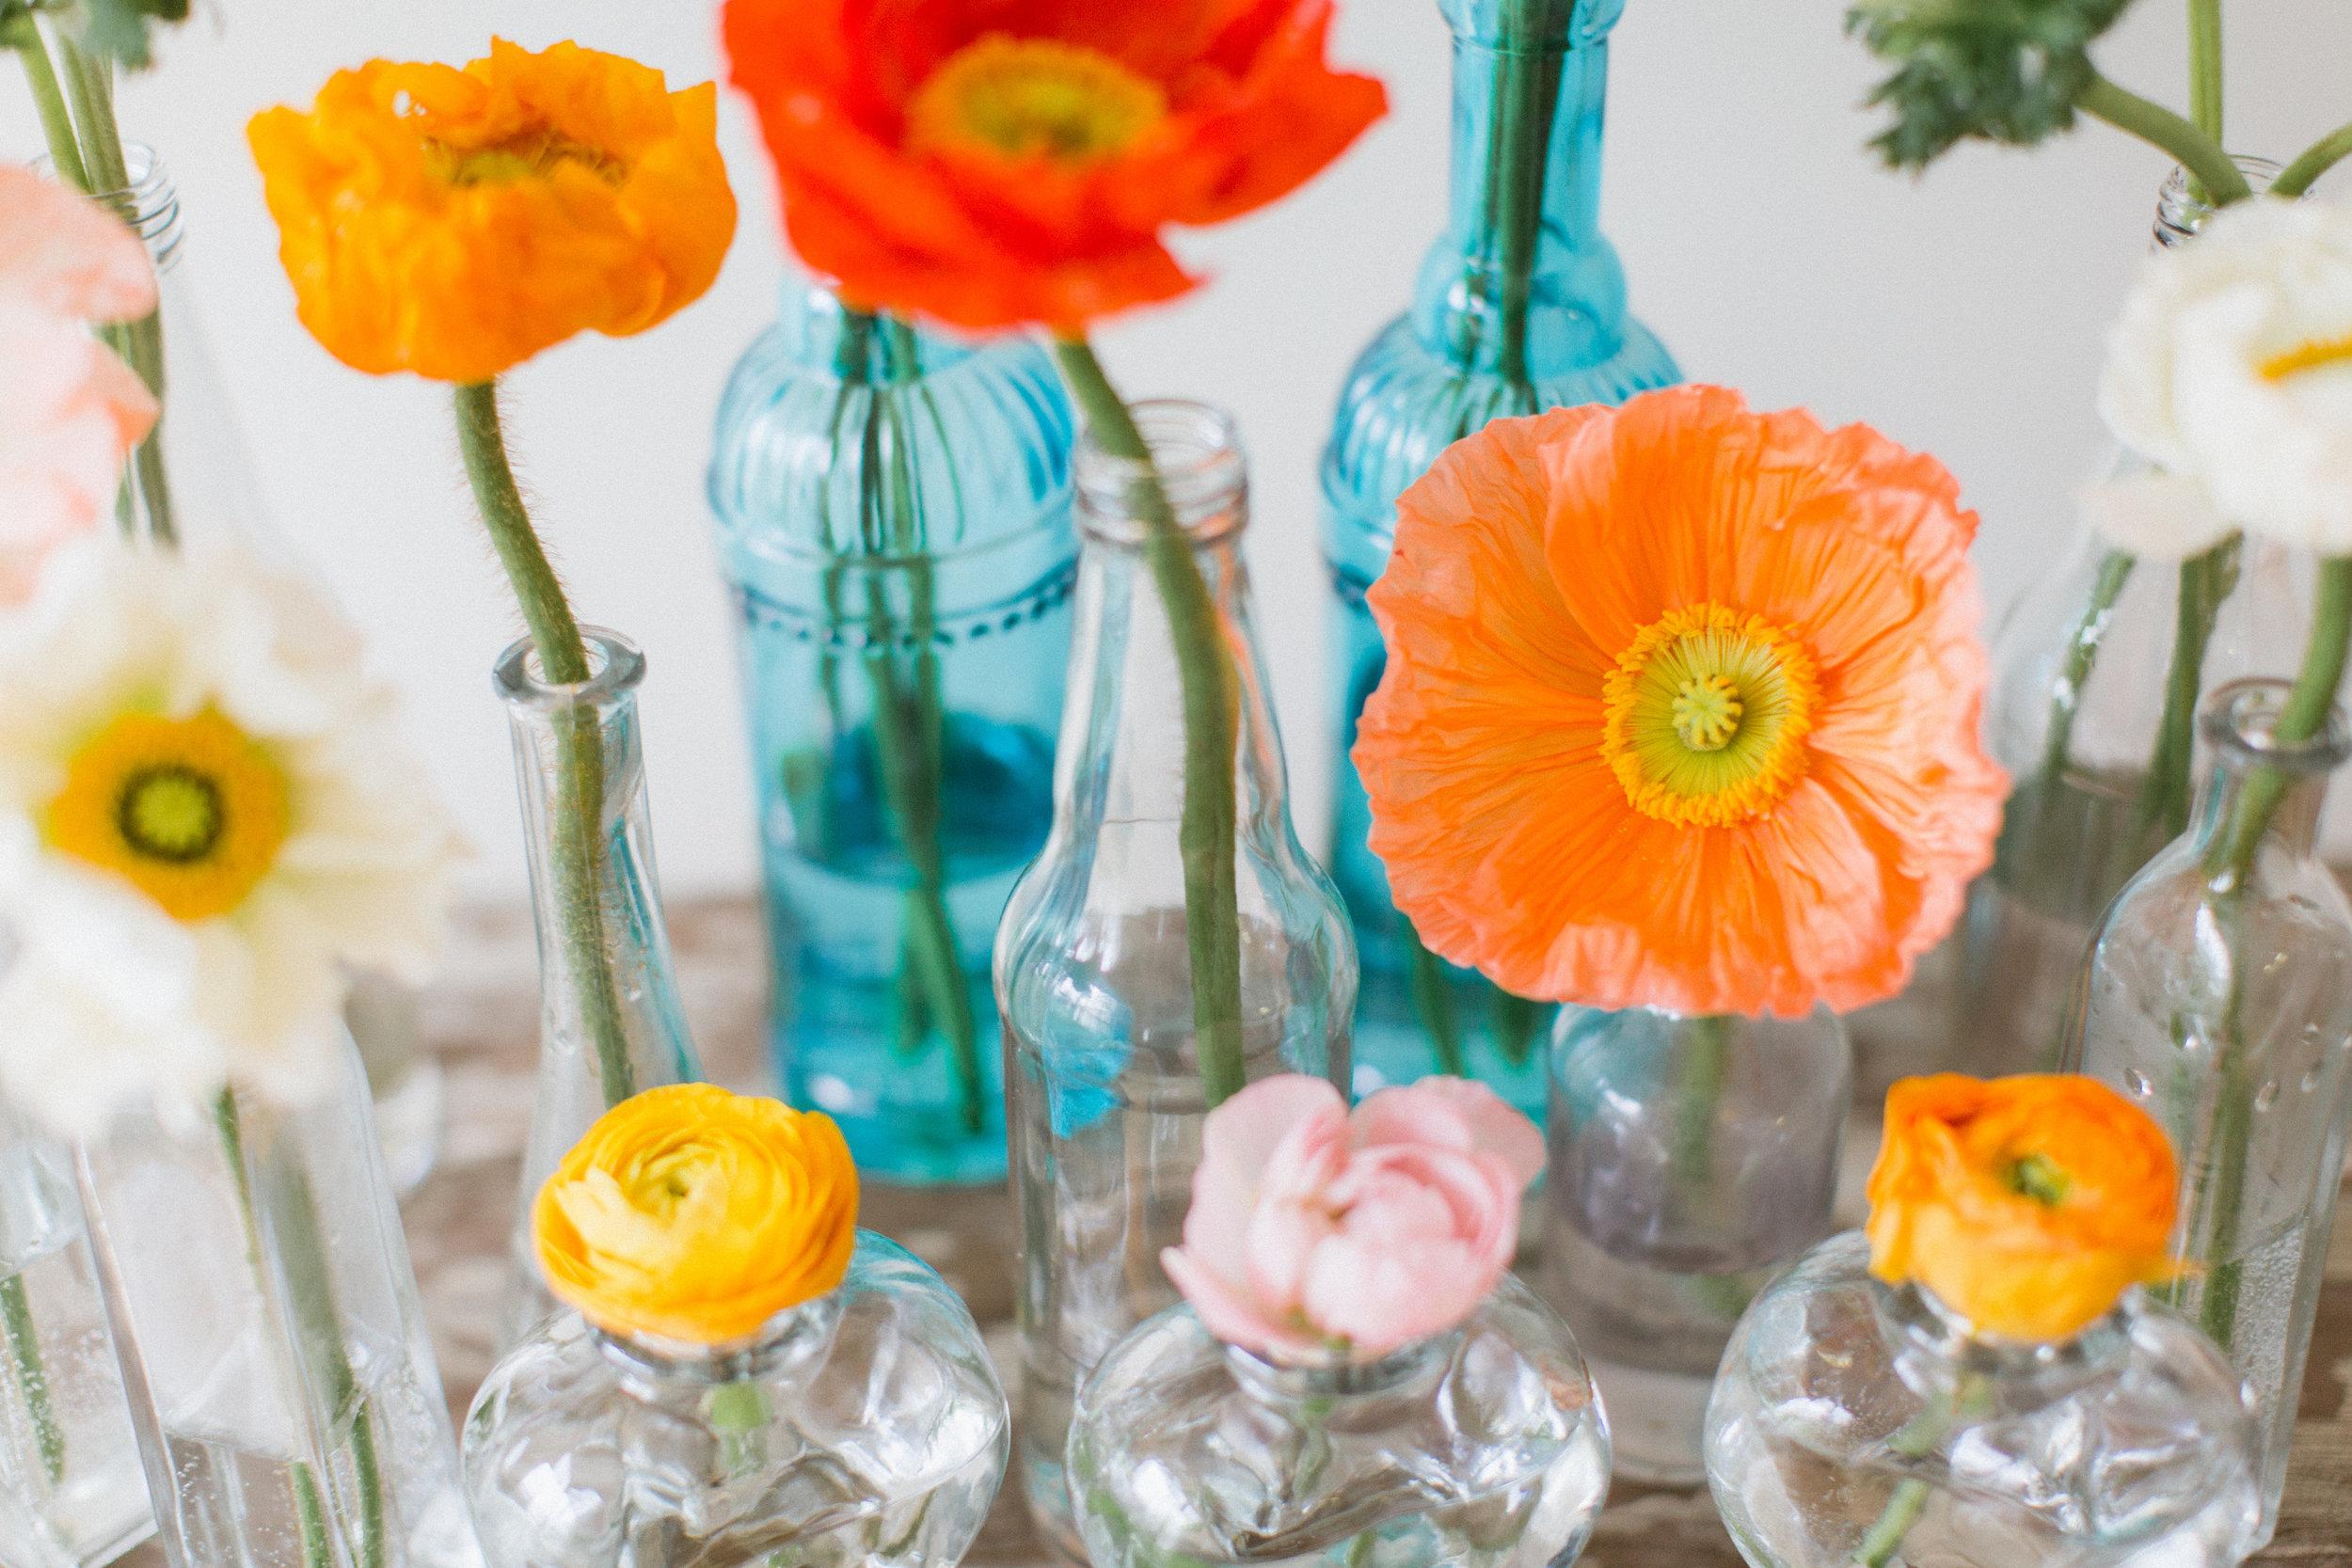 cam_bouquet_and_bottles_0006.jpg